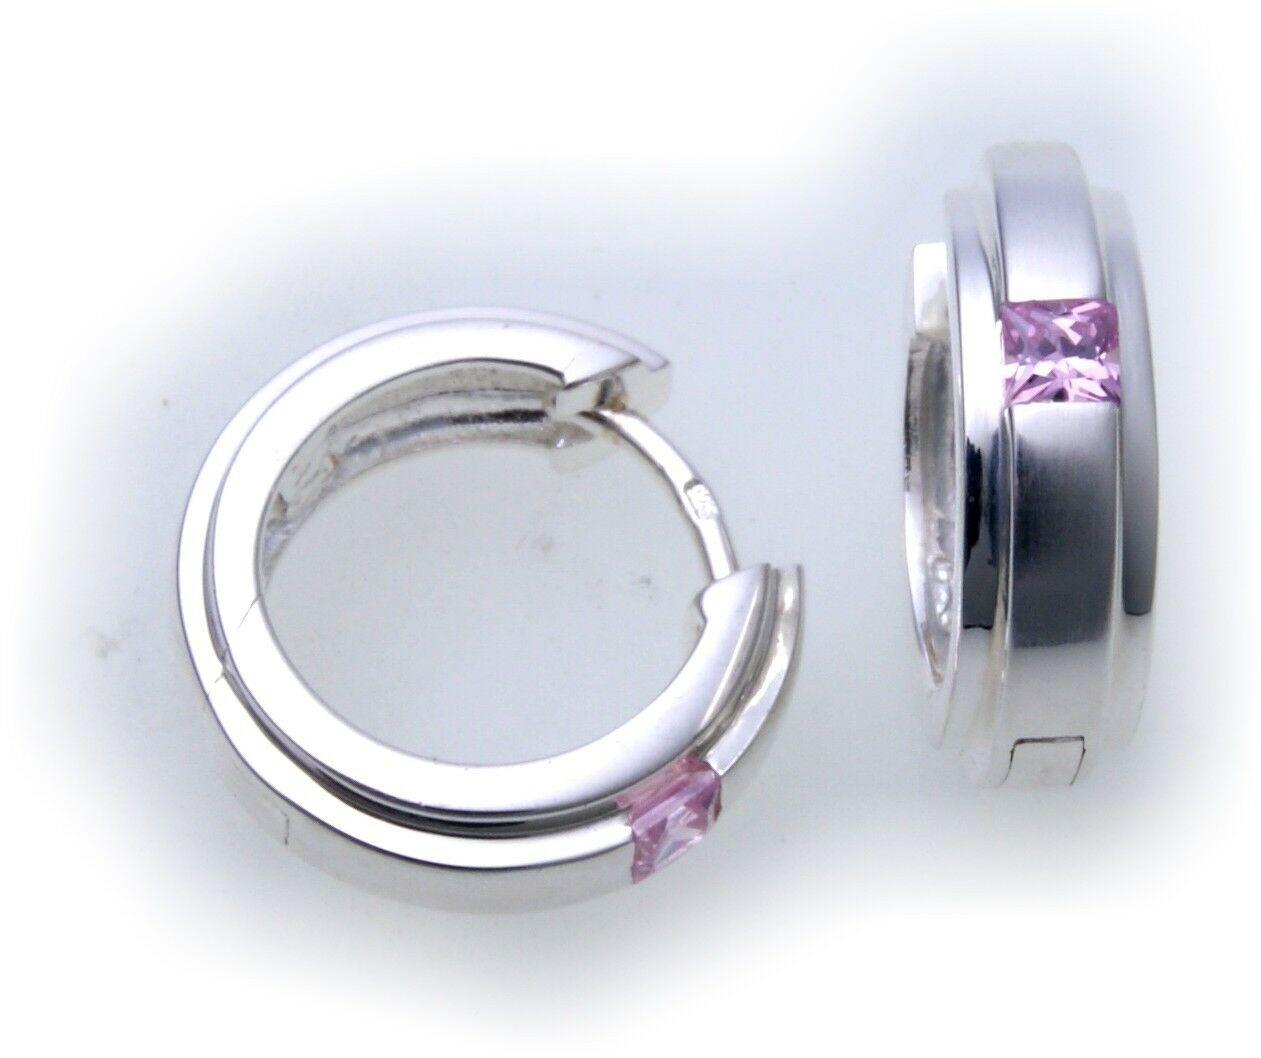 edle Ohrringe Klapp Creolen Zirkonia pink echt Silber 925 Sterlingsilber